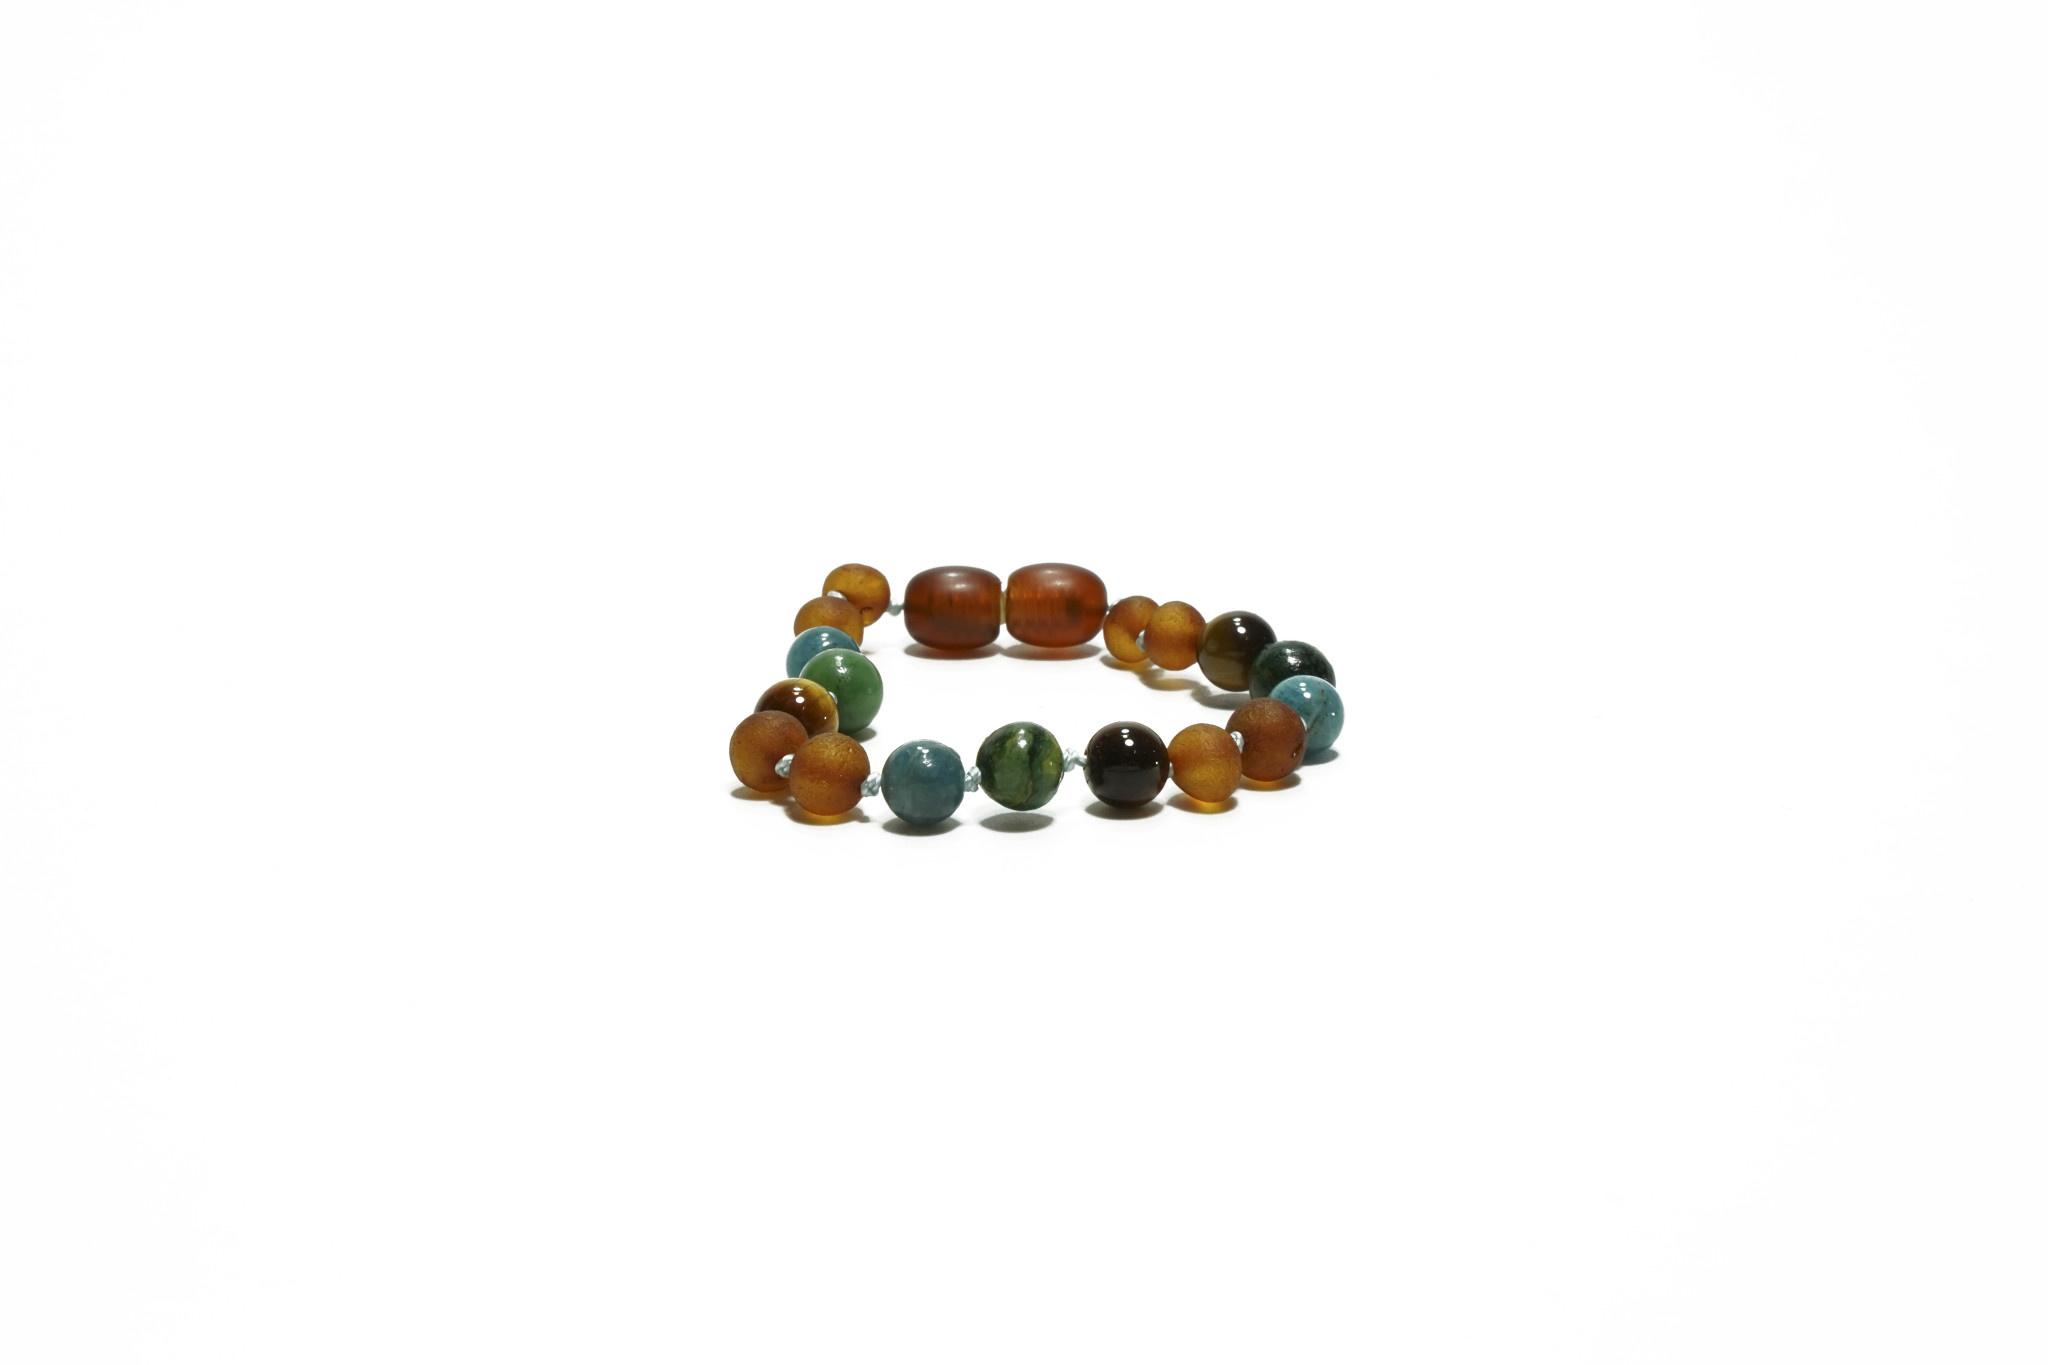 Mahina La barnsteen armband healing kind-1